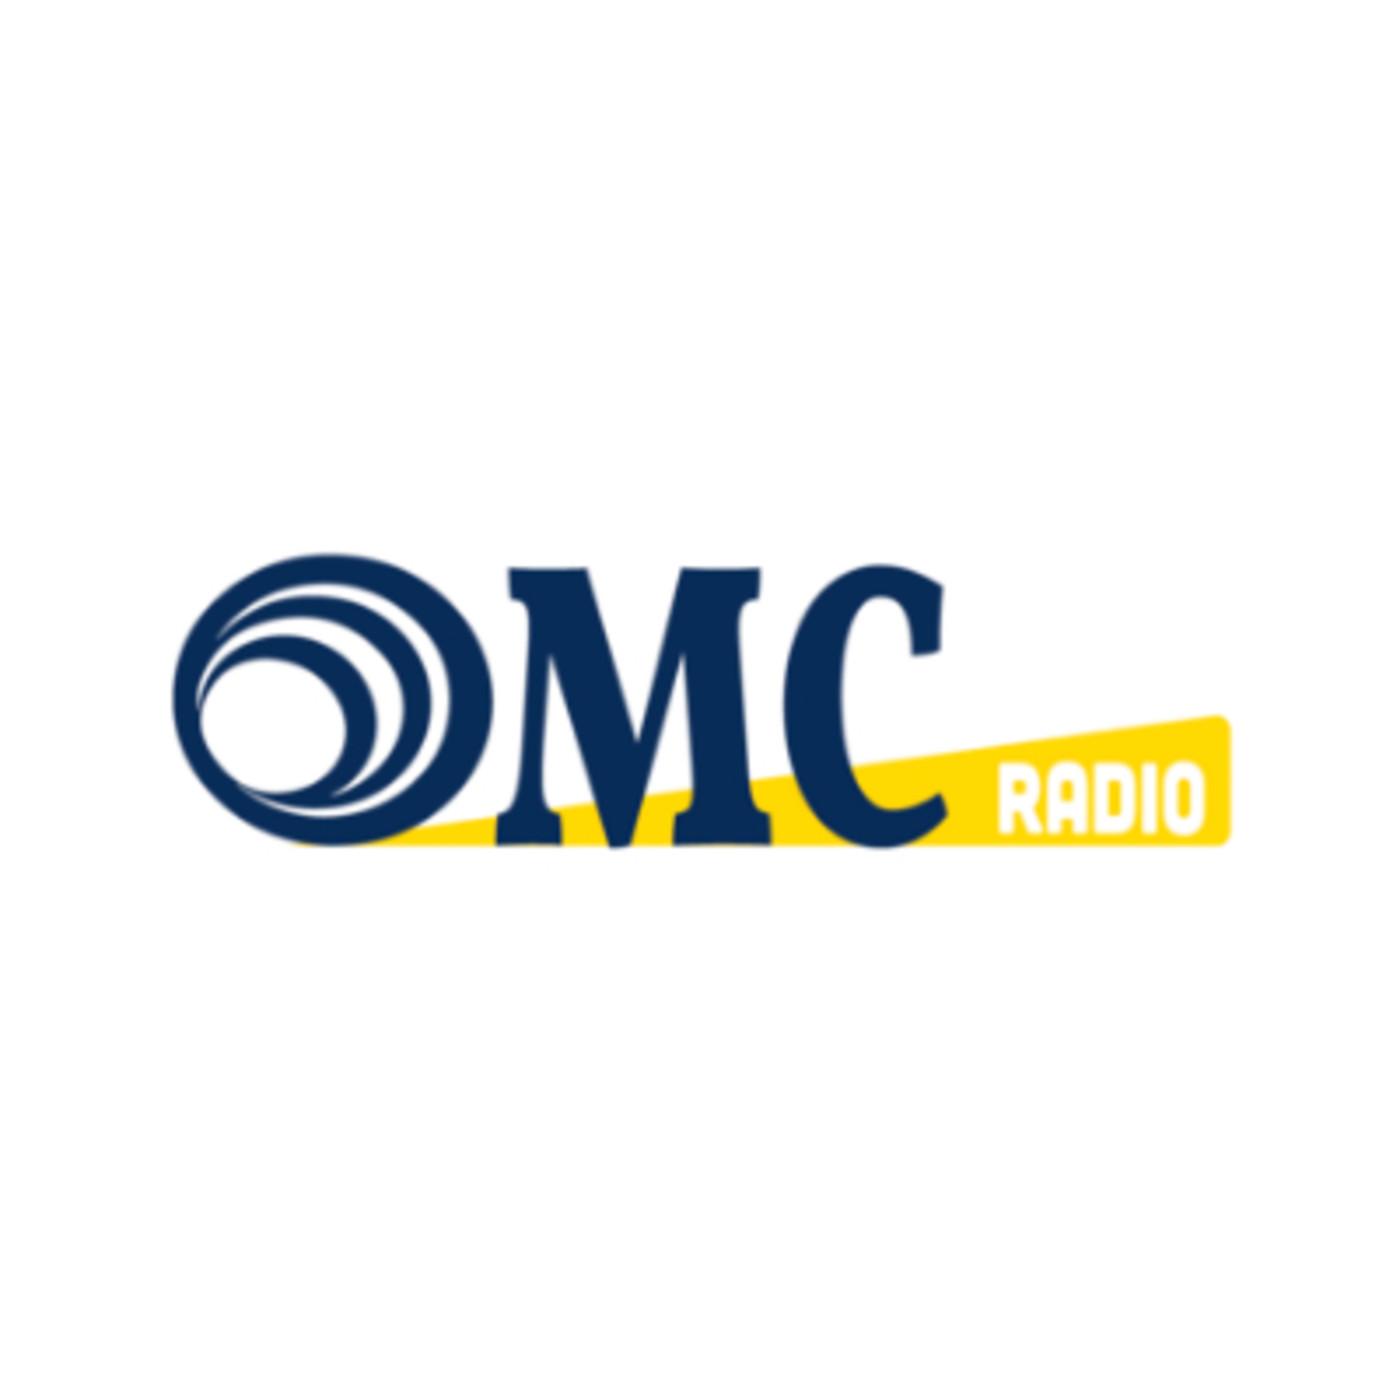 OmcRadio